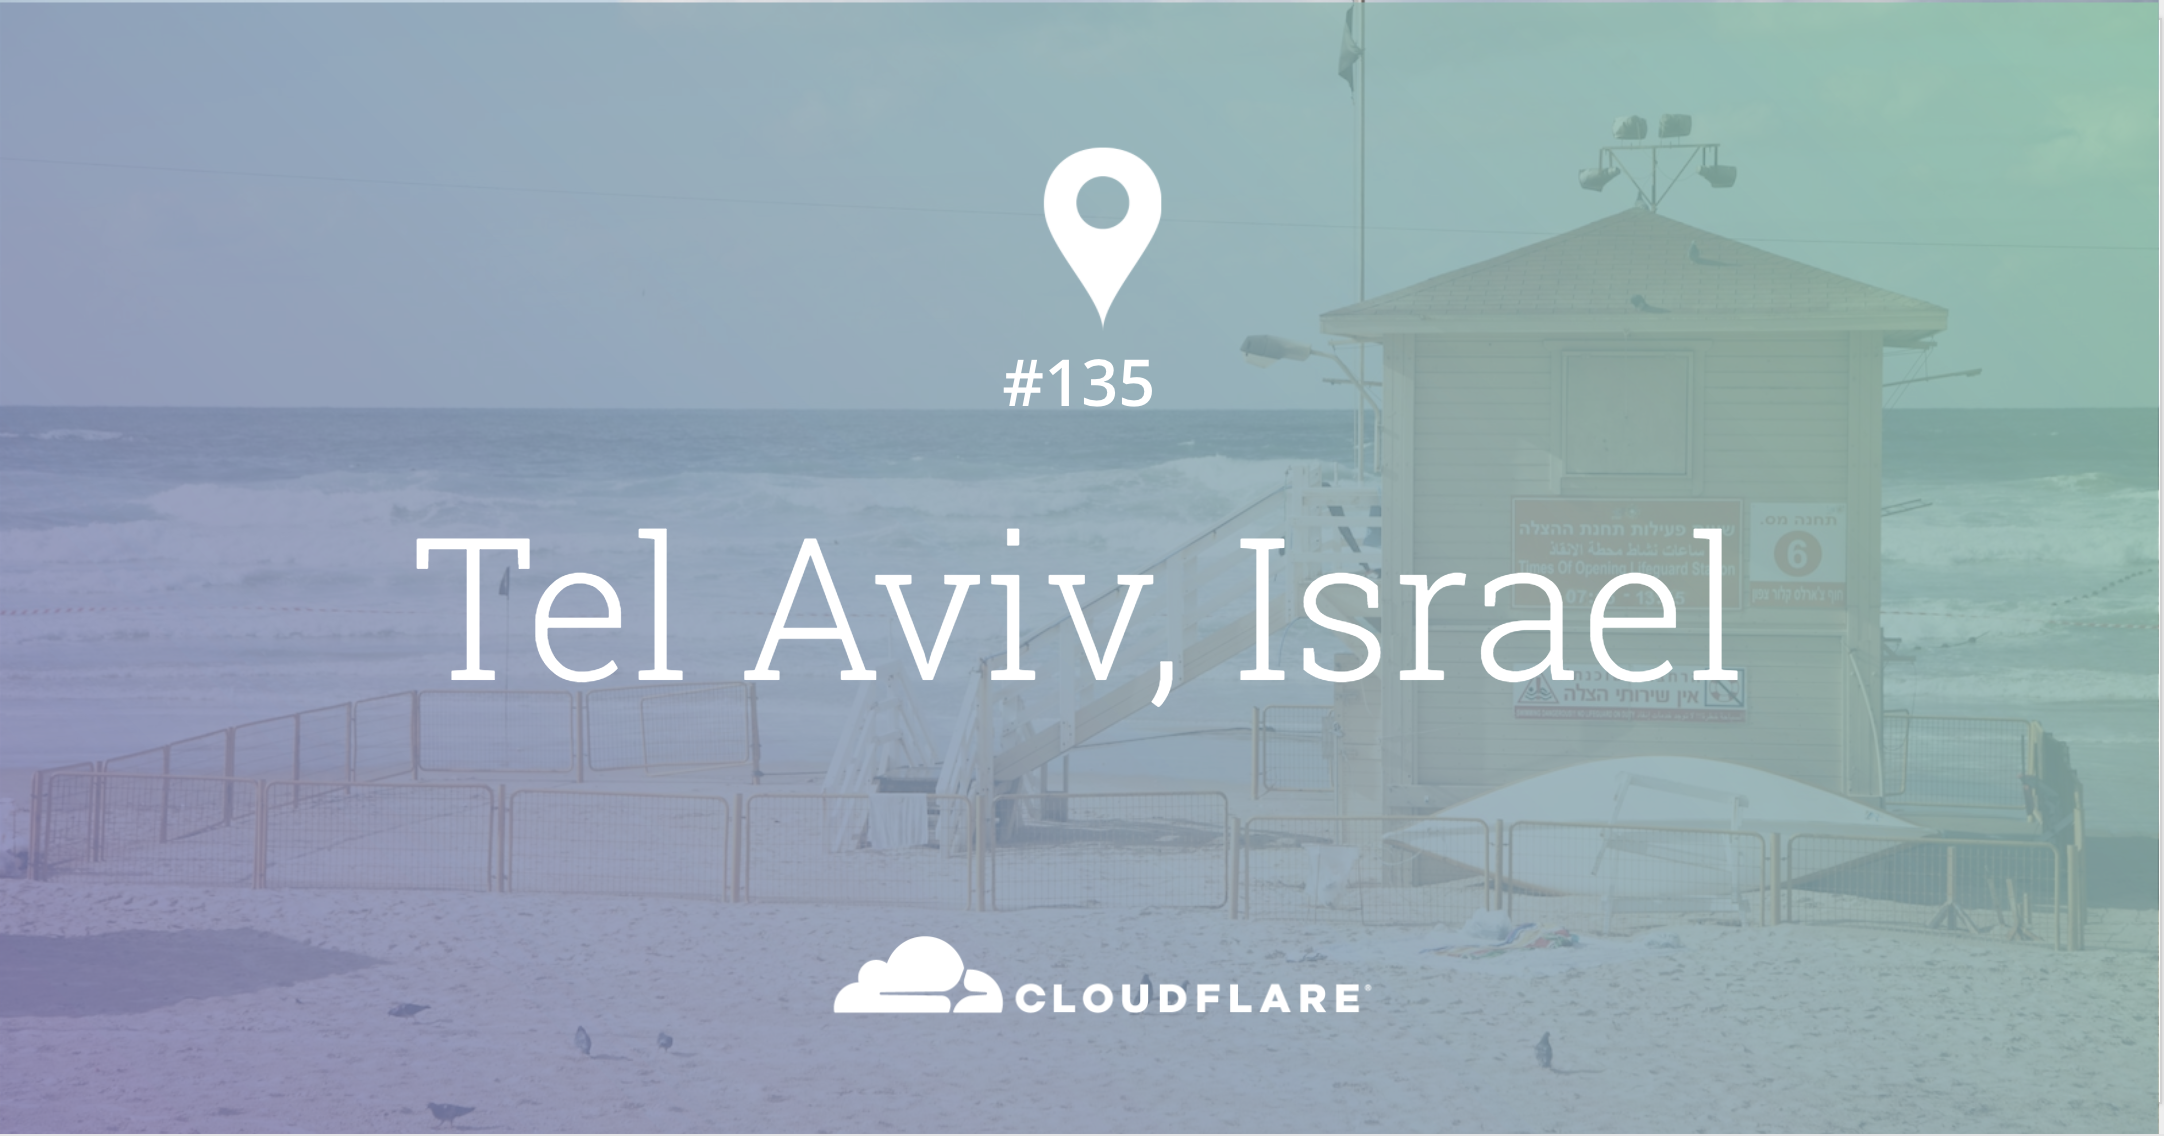 Tel Aviv, Israel: Cloudflare's 135th Data Center Now Live!